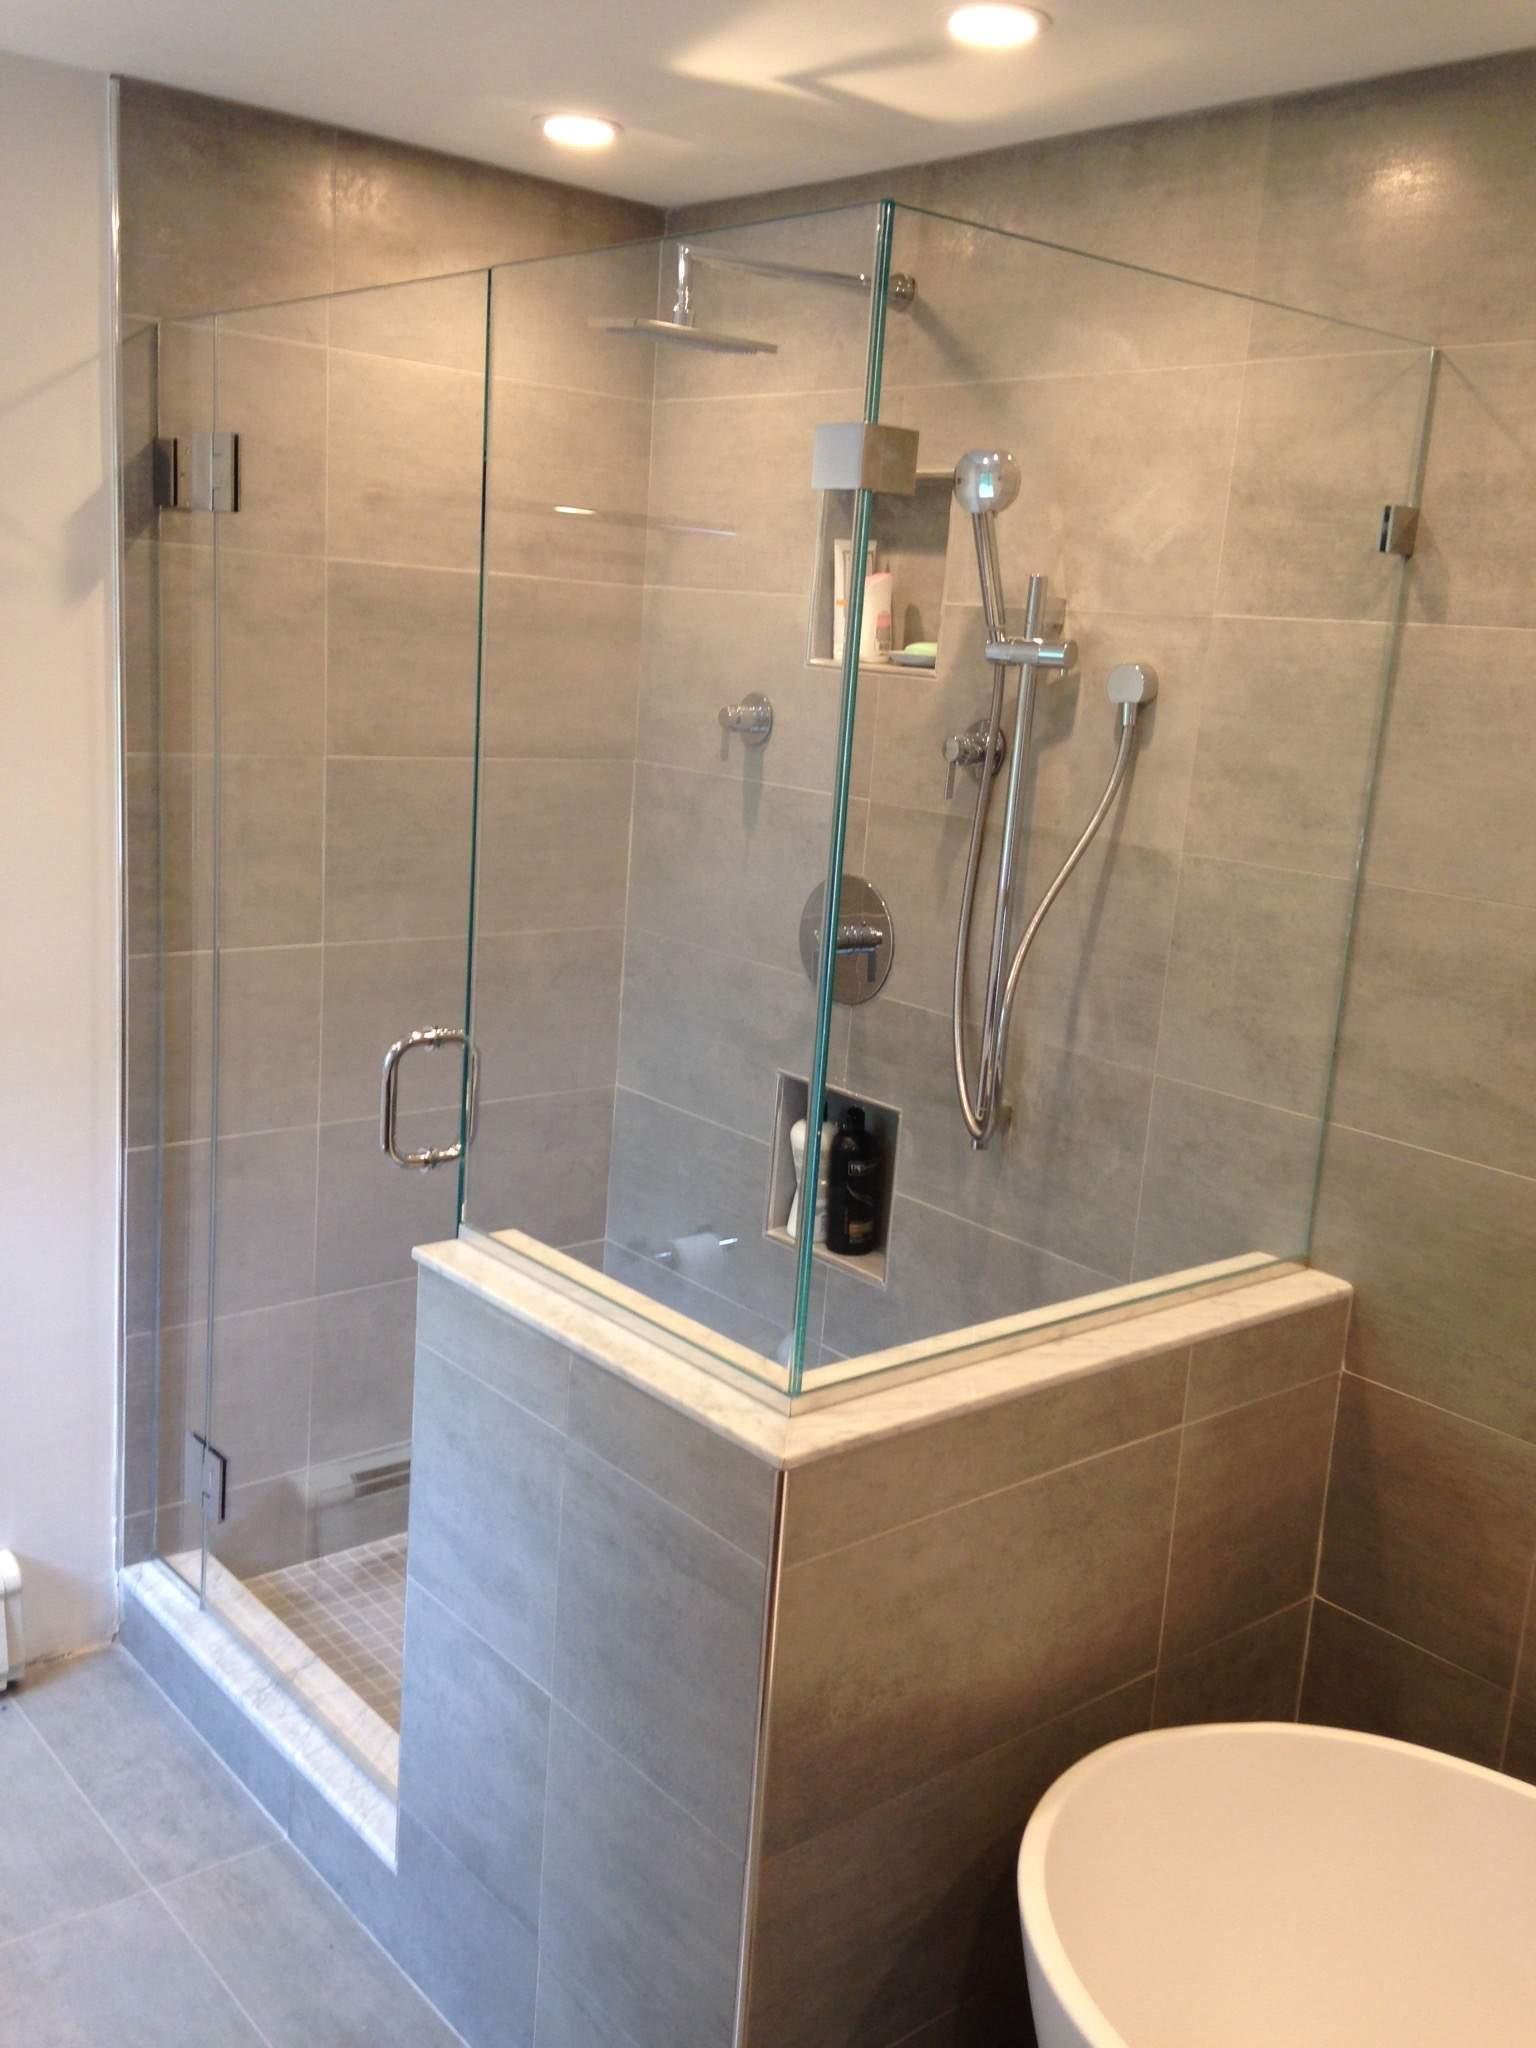 Frameless Glass Shower Door Yorktown Heights N.Y. & Absolute Shower Doors. The Best in Custom Glass Shower Doors Since 1995